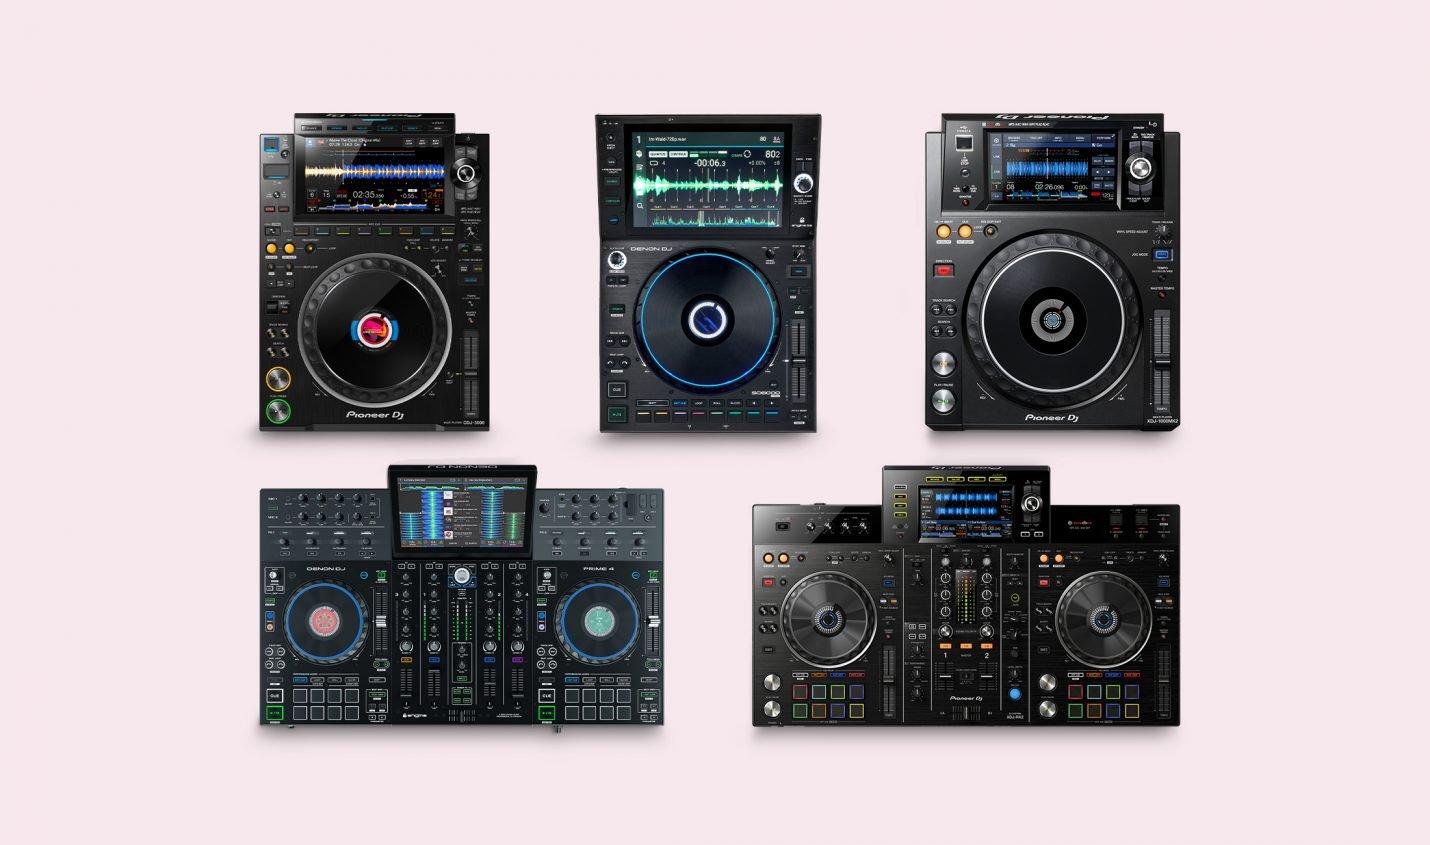 Überblick: Die besten DJ-Mediaplayer | 2021